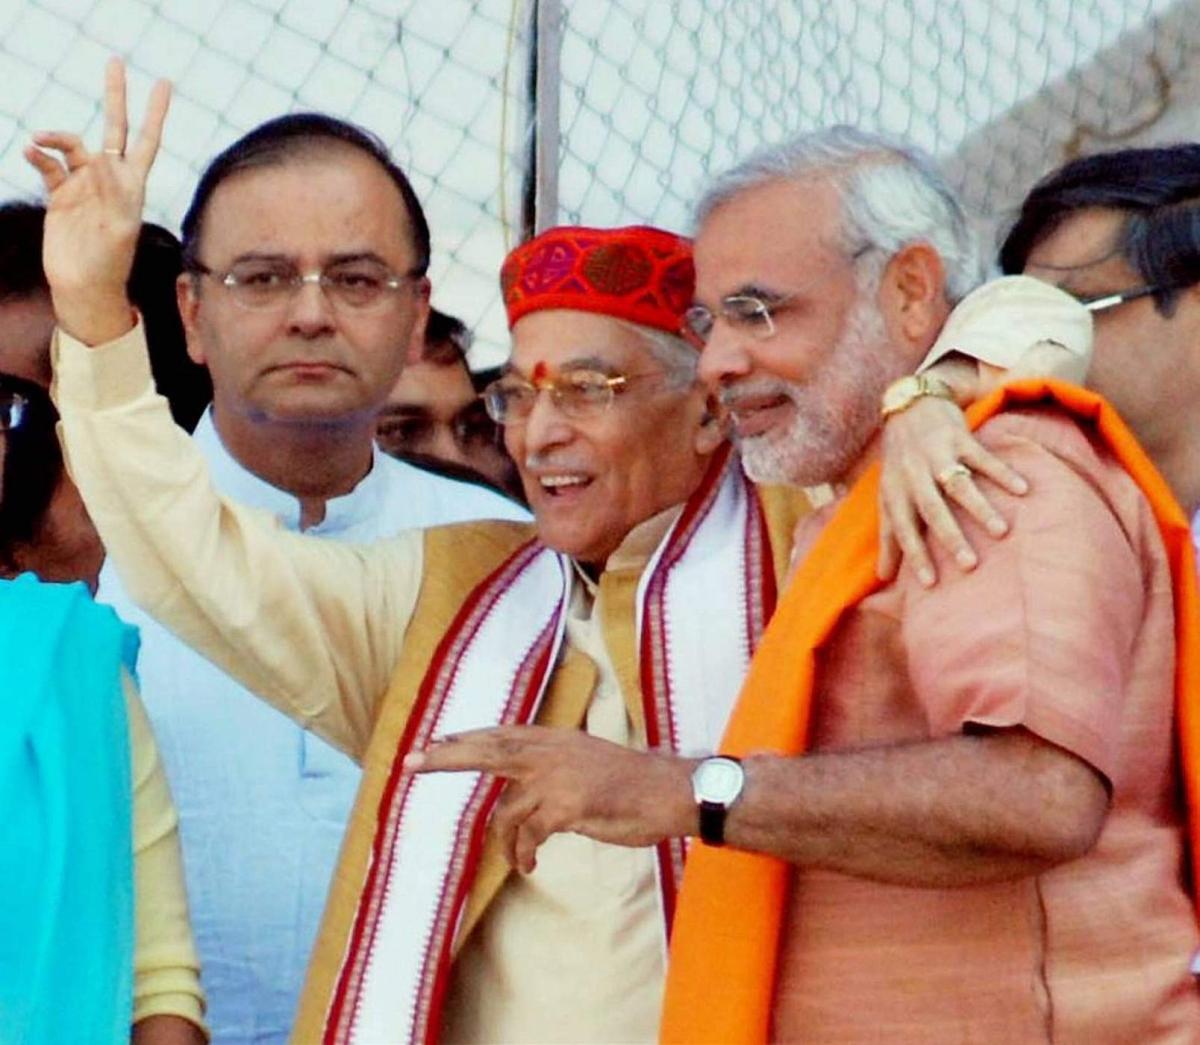 BJP leader Murli Manohar Joshi hugs Narendra Modi, while Arun Jaitley looks on, before the oath taking ceremony of Modi as Gujarat Chief Minister at Sardar Patel stadium in Ahmedabad in 2007.